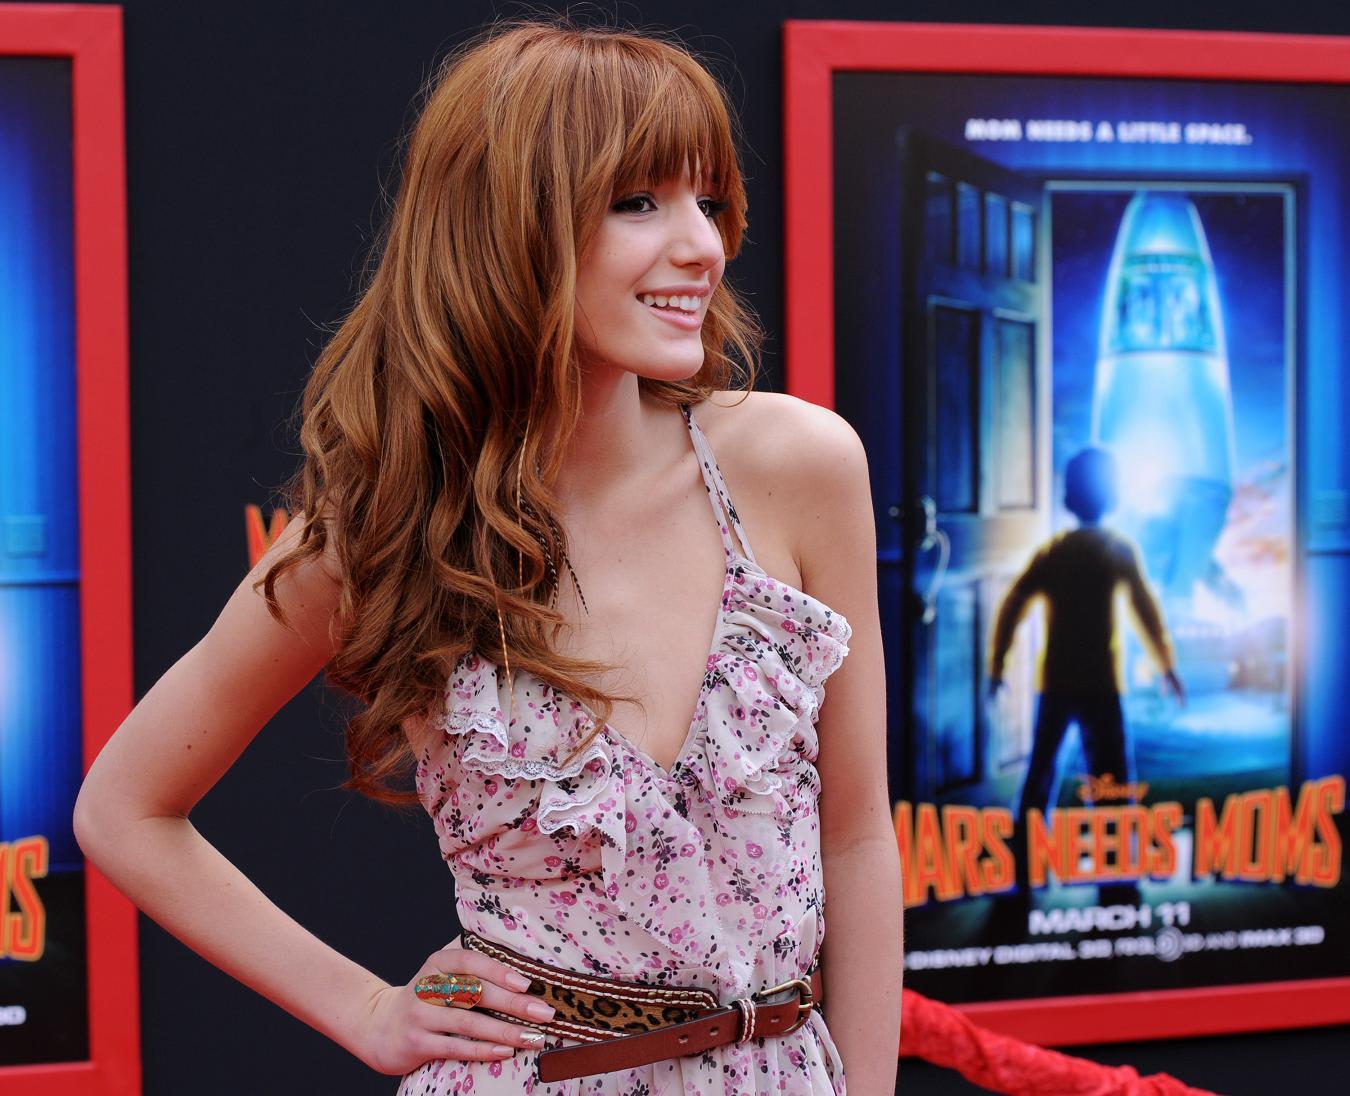 Bella Thorne filming Shake It Up in Studio City 28 Jun 2012 - ☆Favorite Celebrity ...